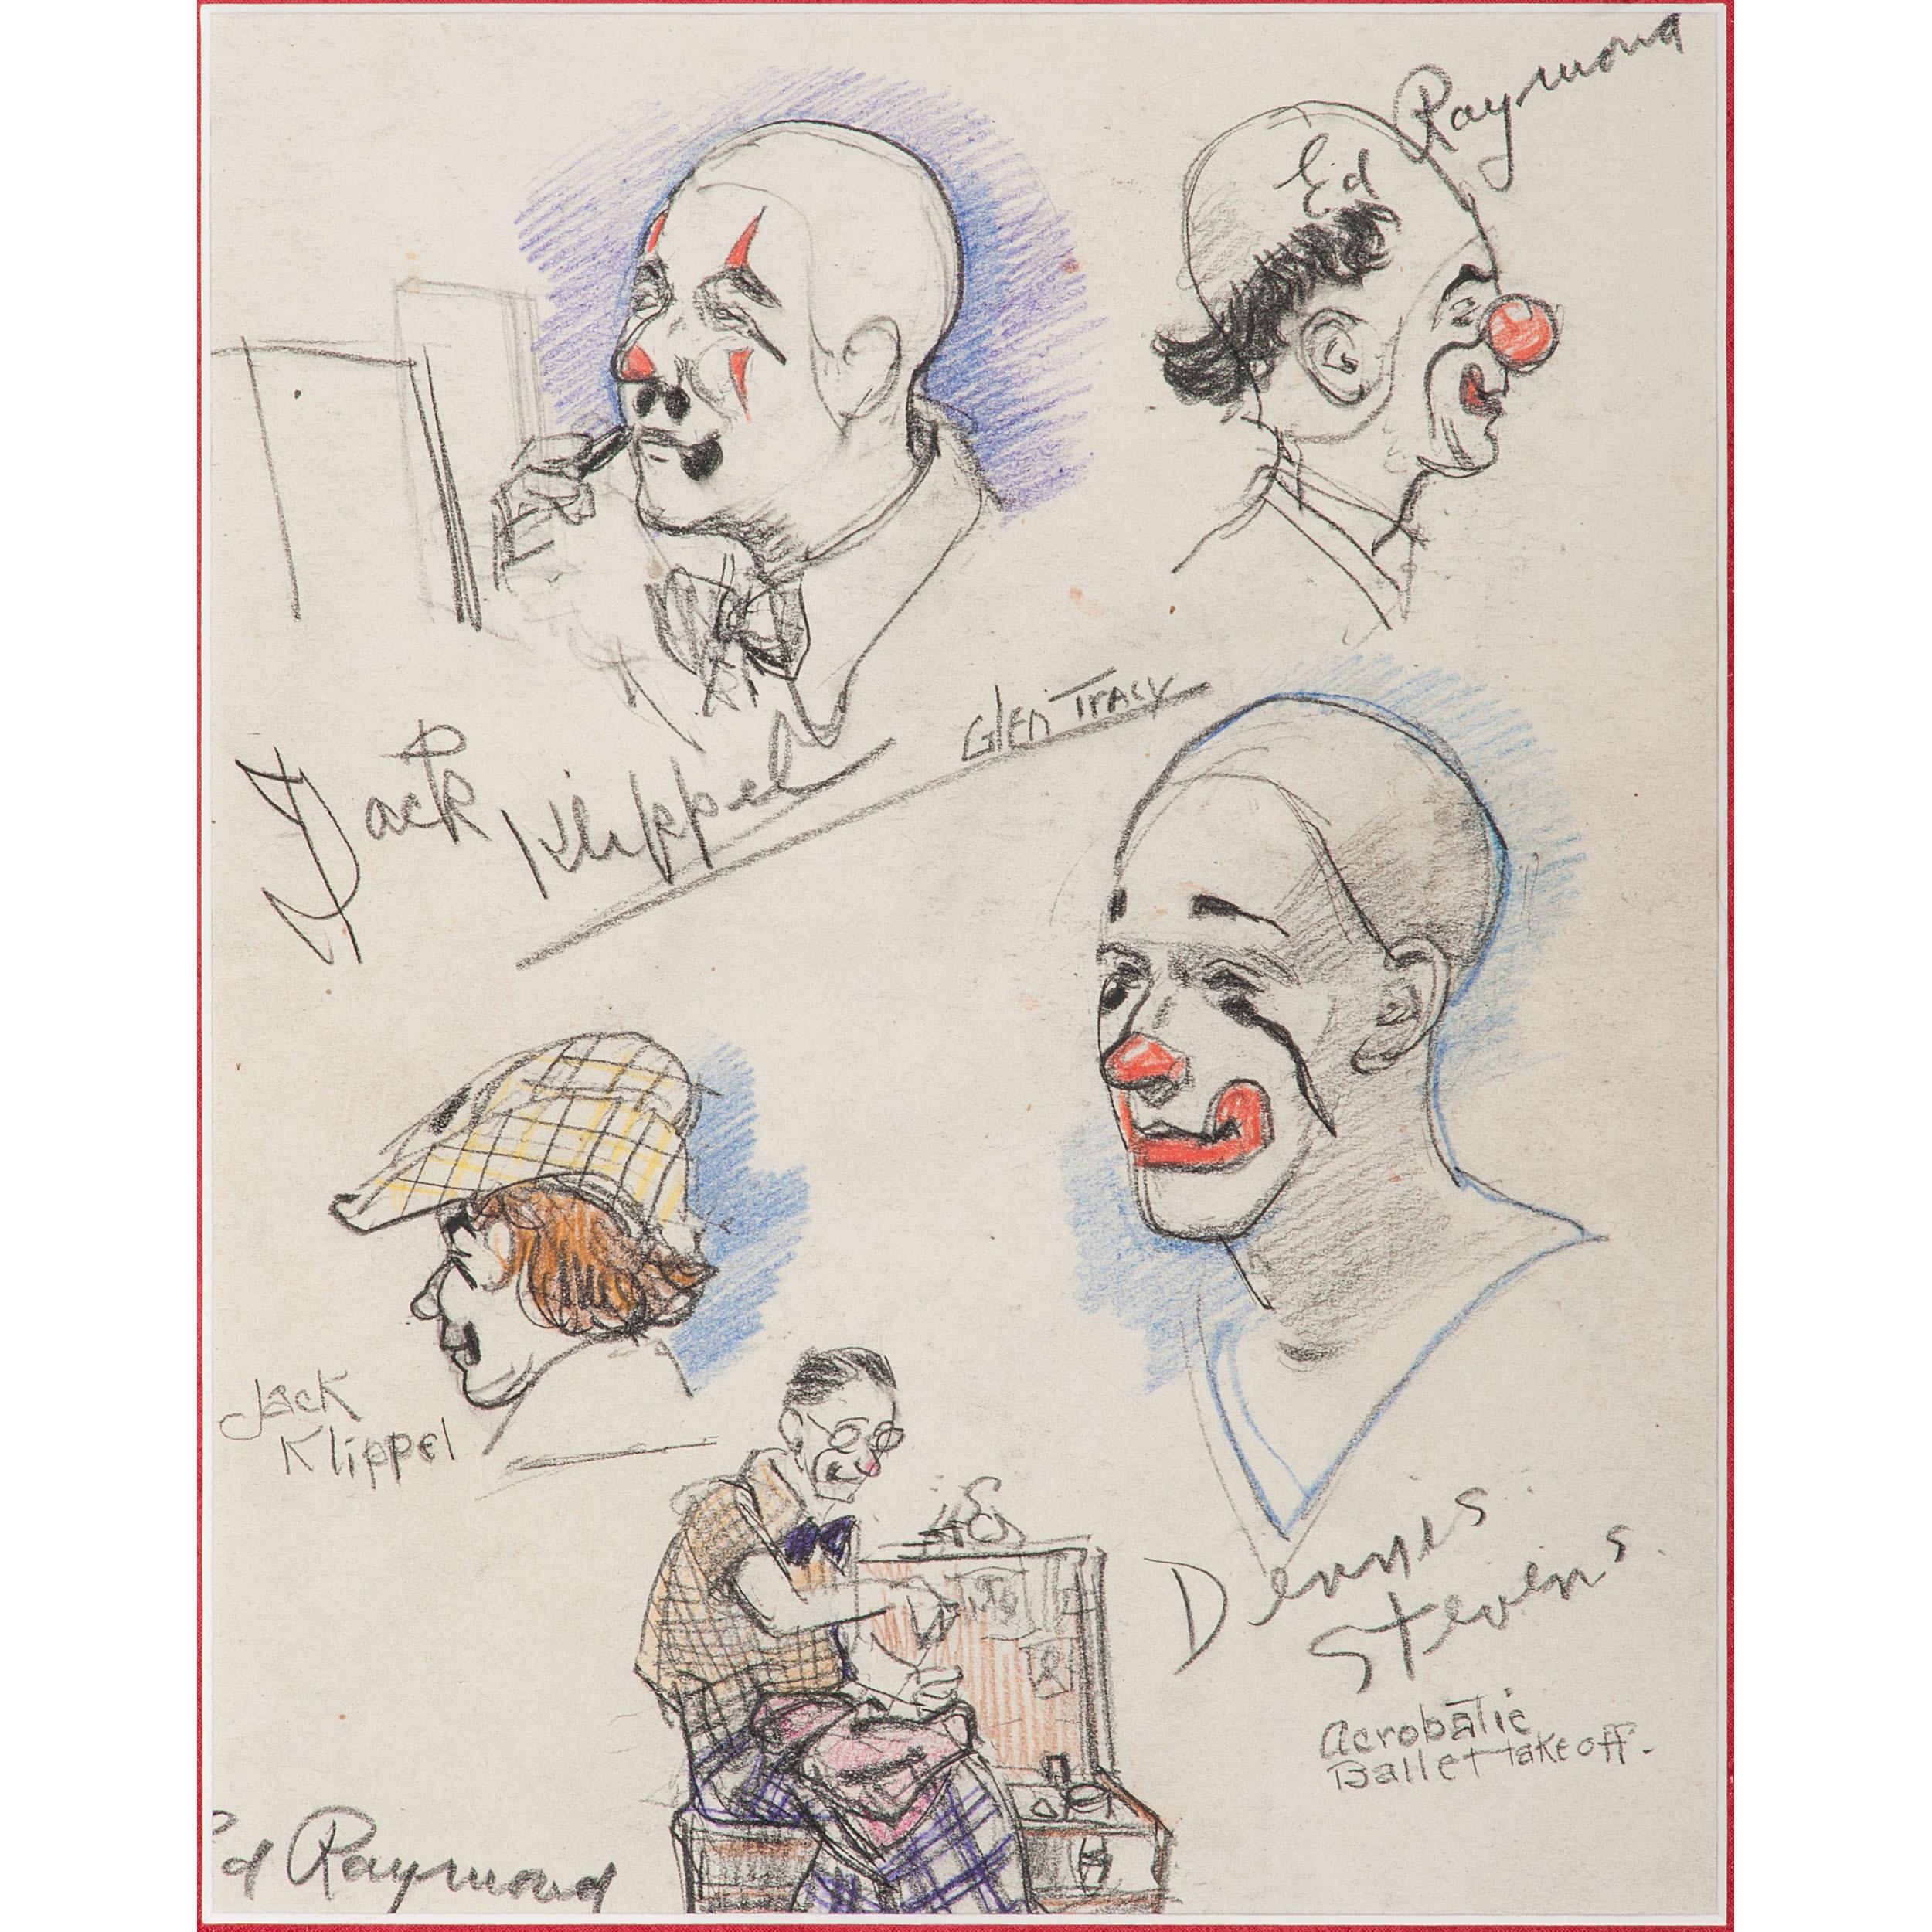 Glen tracy cincinnati 1883 1956 four graphite and pencil drawings